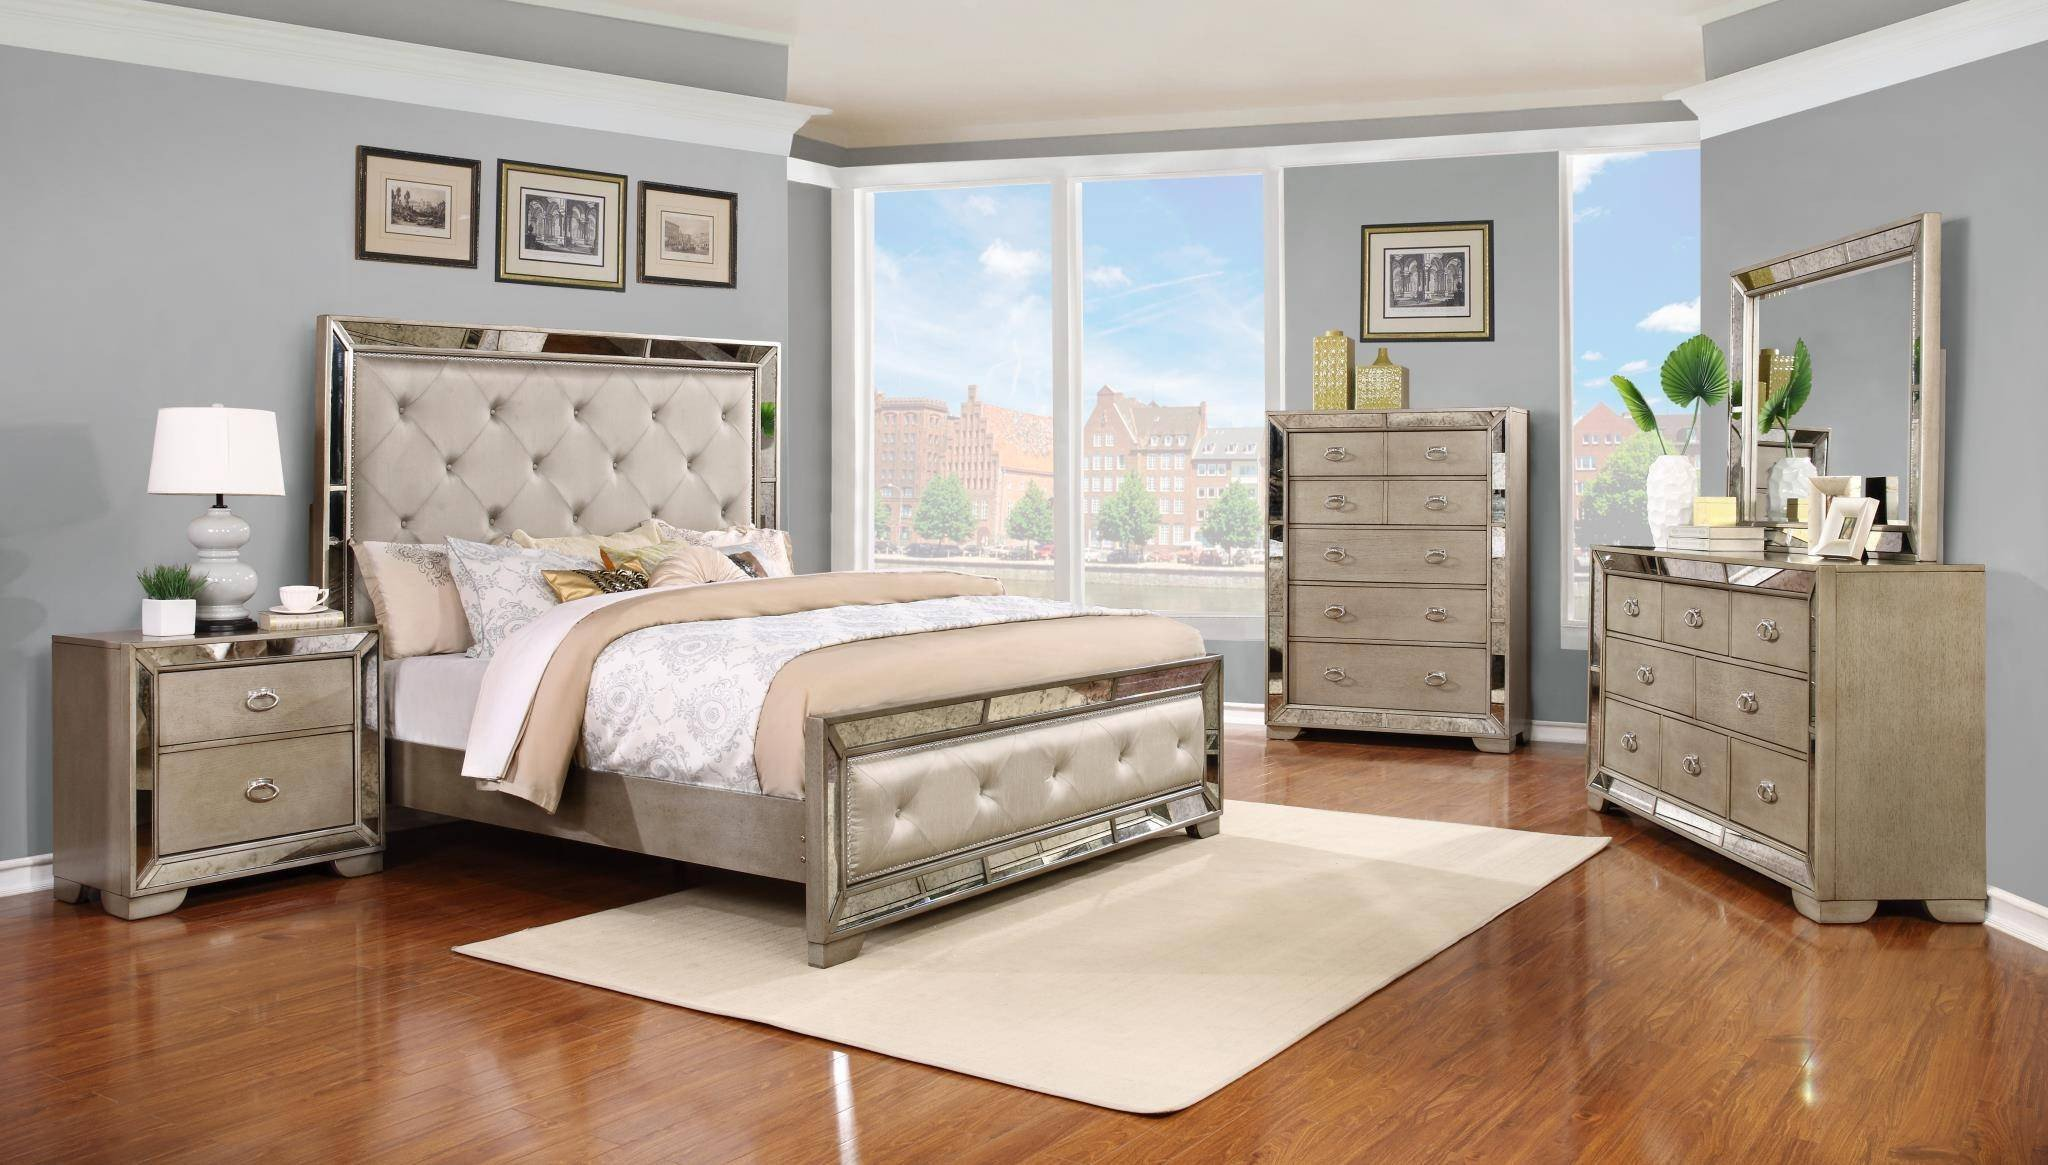 Bedroom Furniture Set Cheap Luxury soflex Lilyanna Diamond Tufted Headboard Queen Bedroom Set